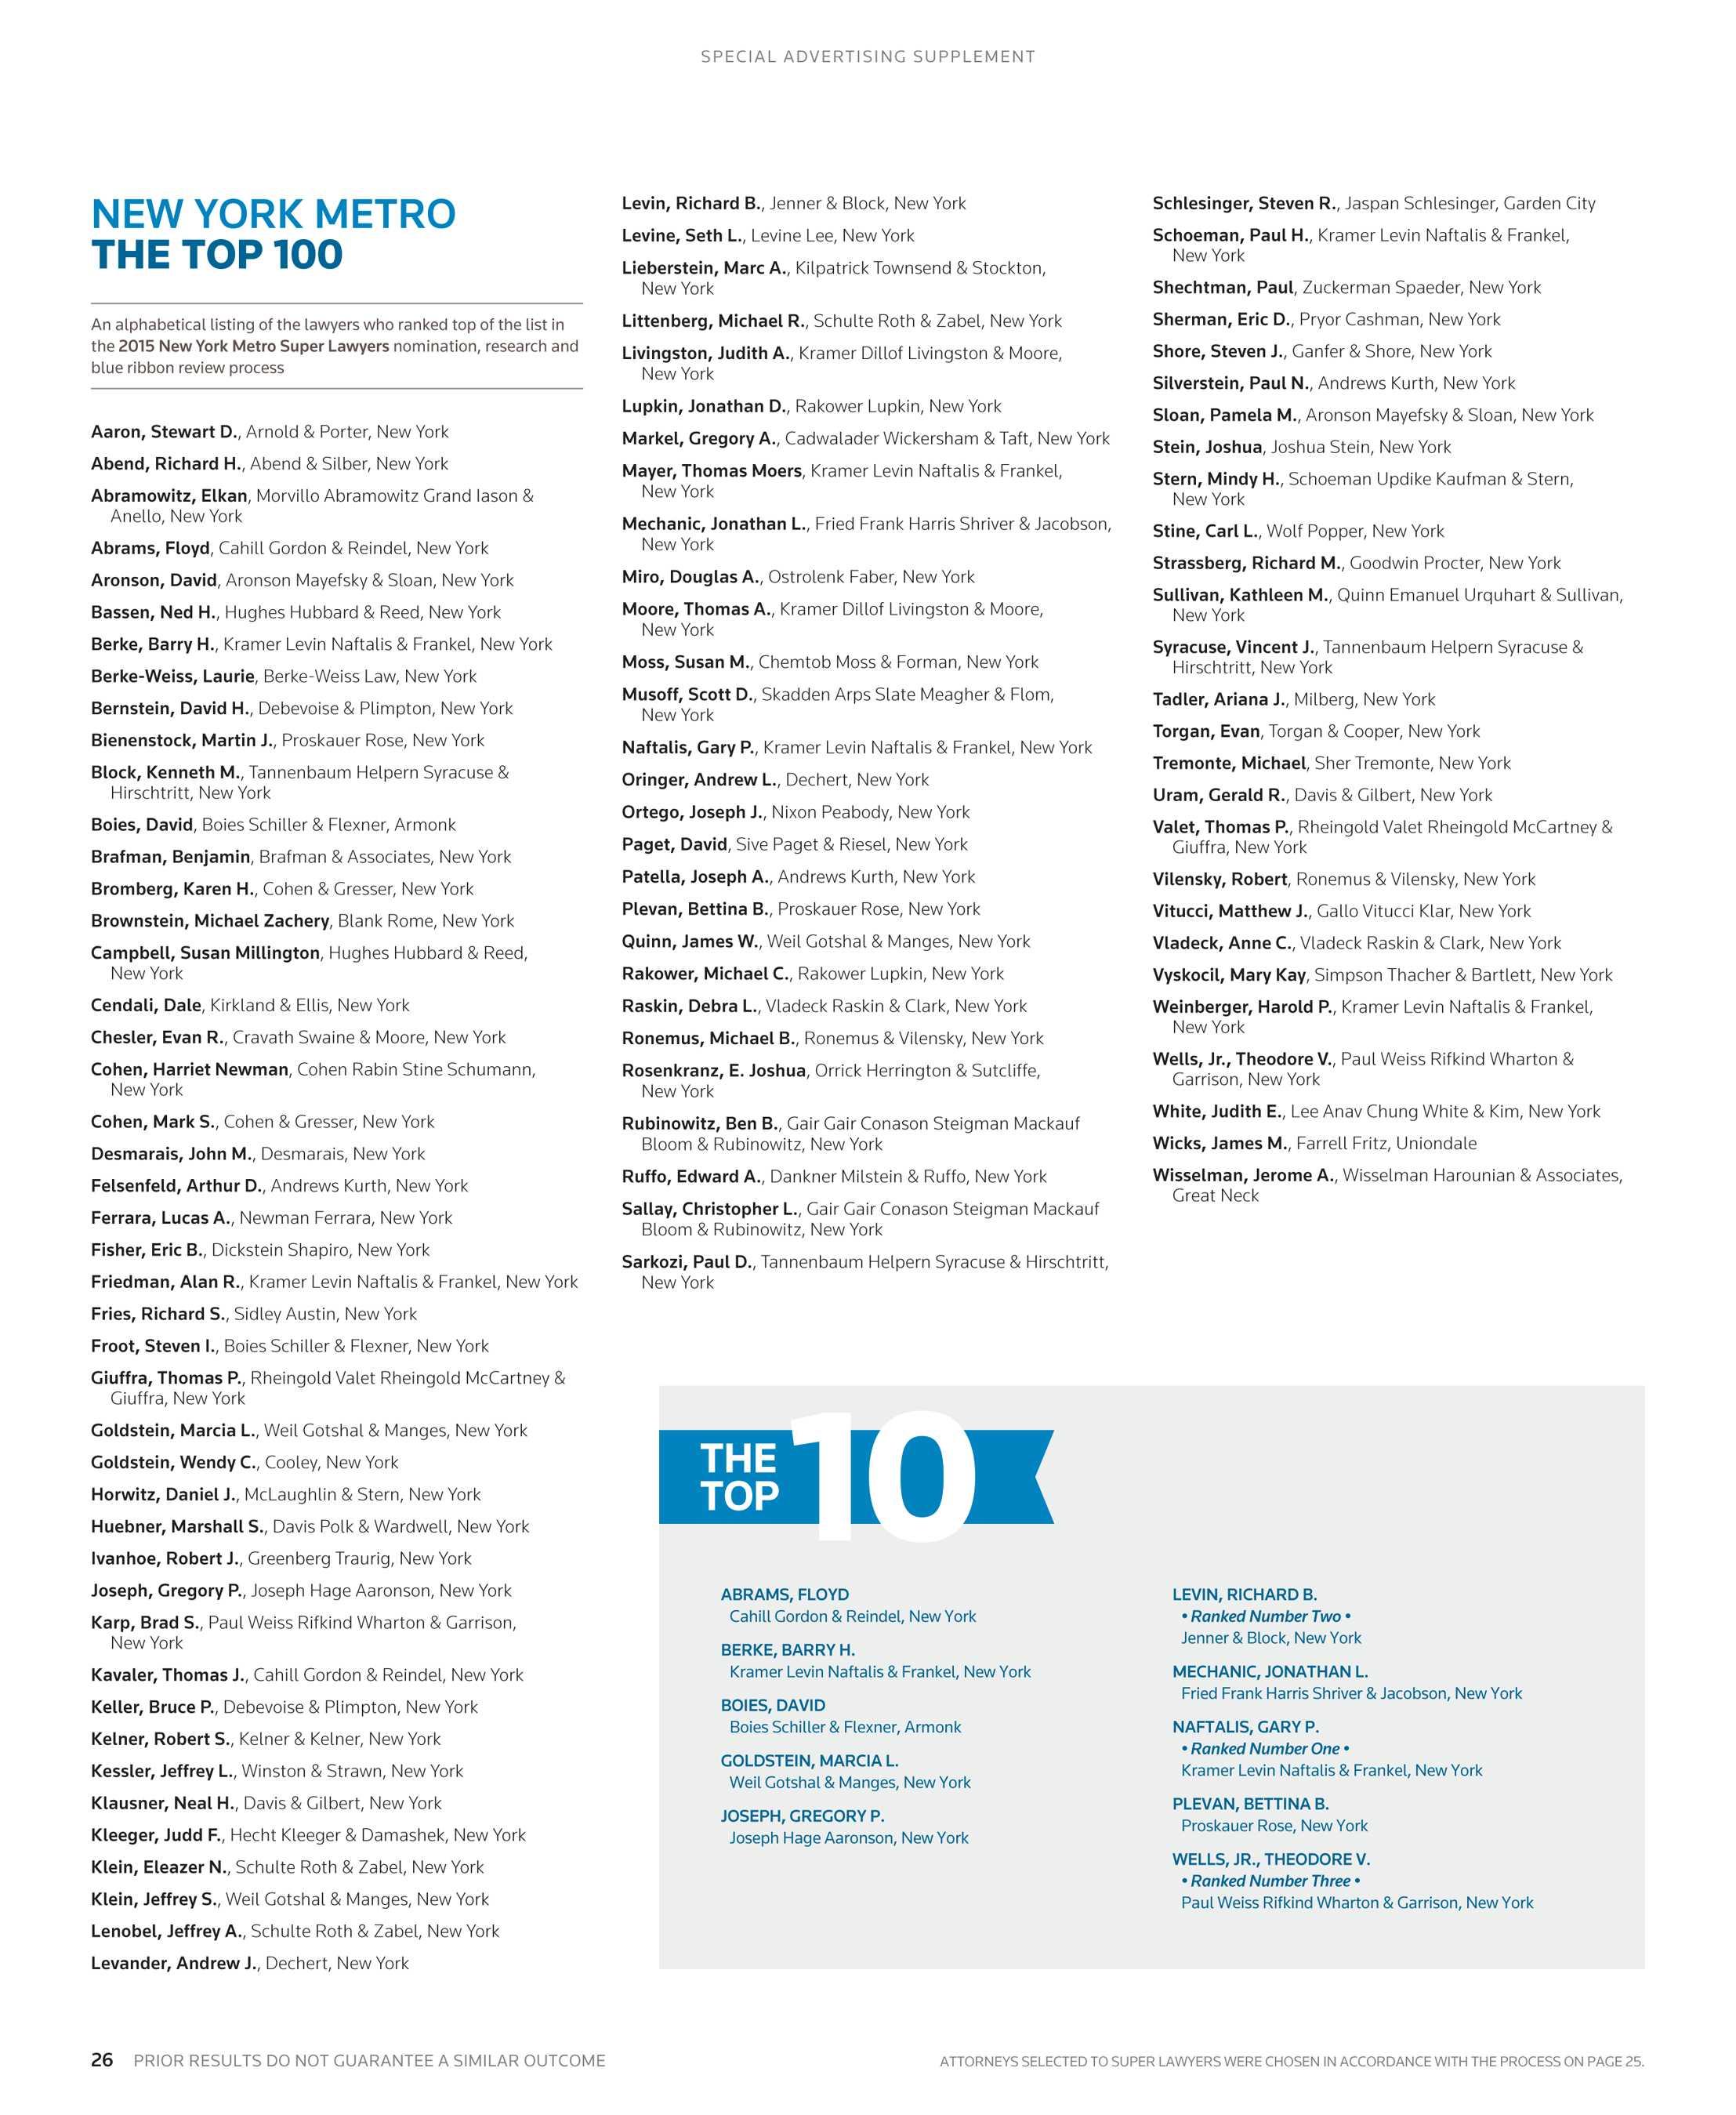 Metro Tannenbaum.Super Lawyers New York Metro 2015 Supplement Page 26